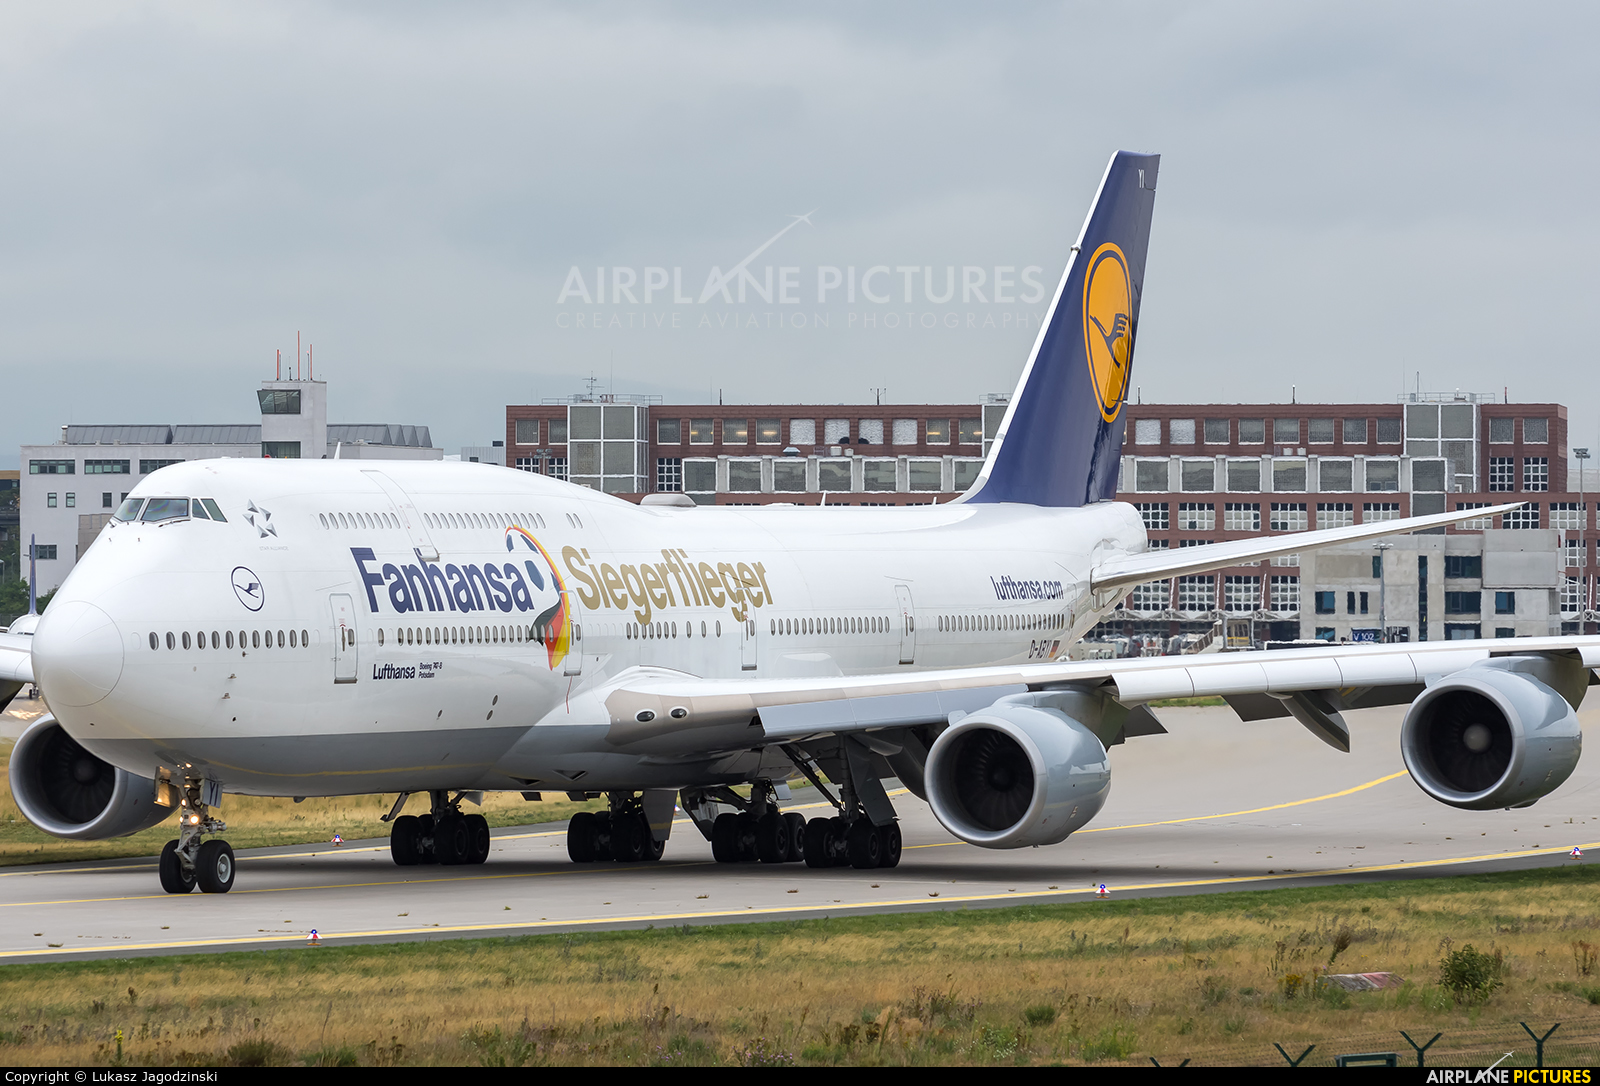 Lufthansa D-ABYI aircraft at Frankfurt